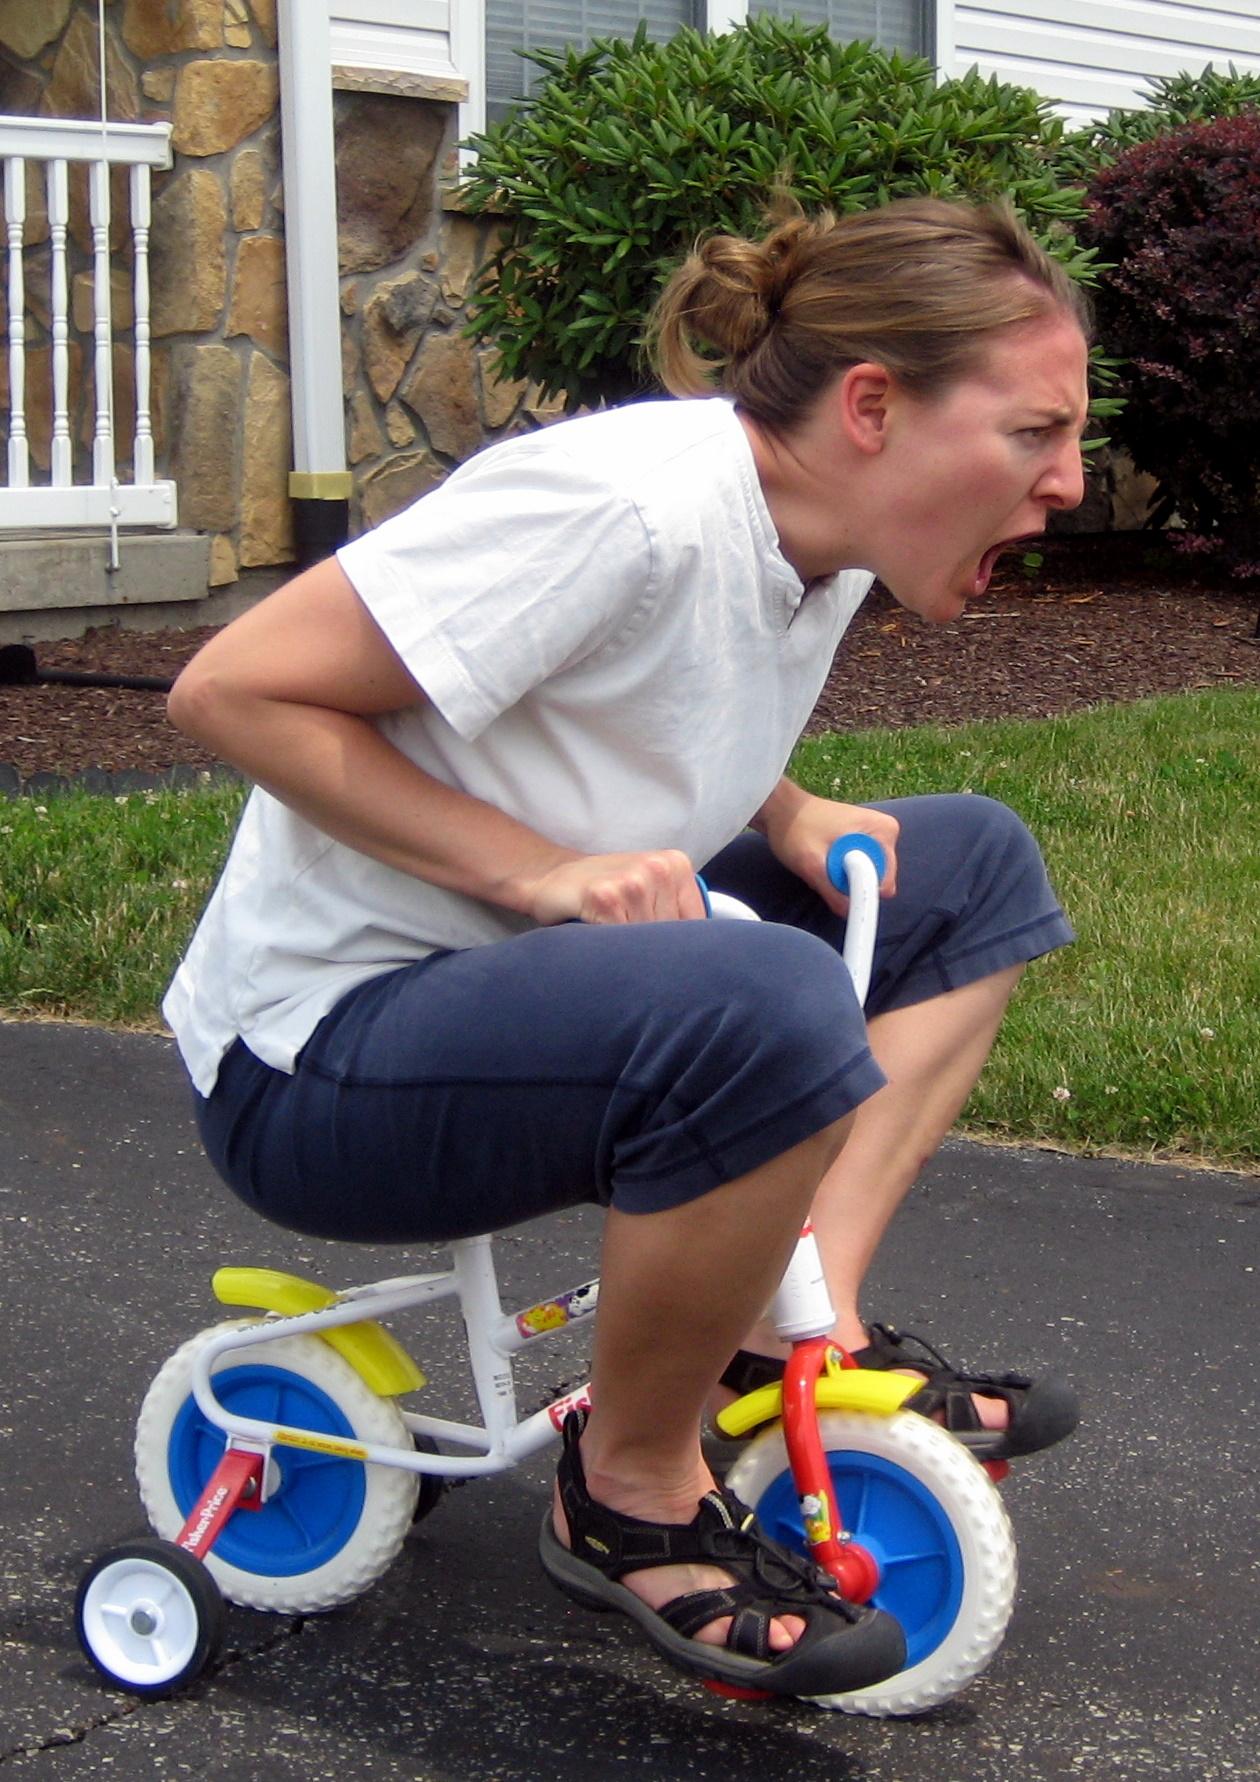 Jill Camirand riding a bike.